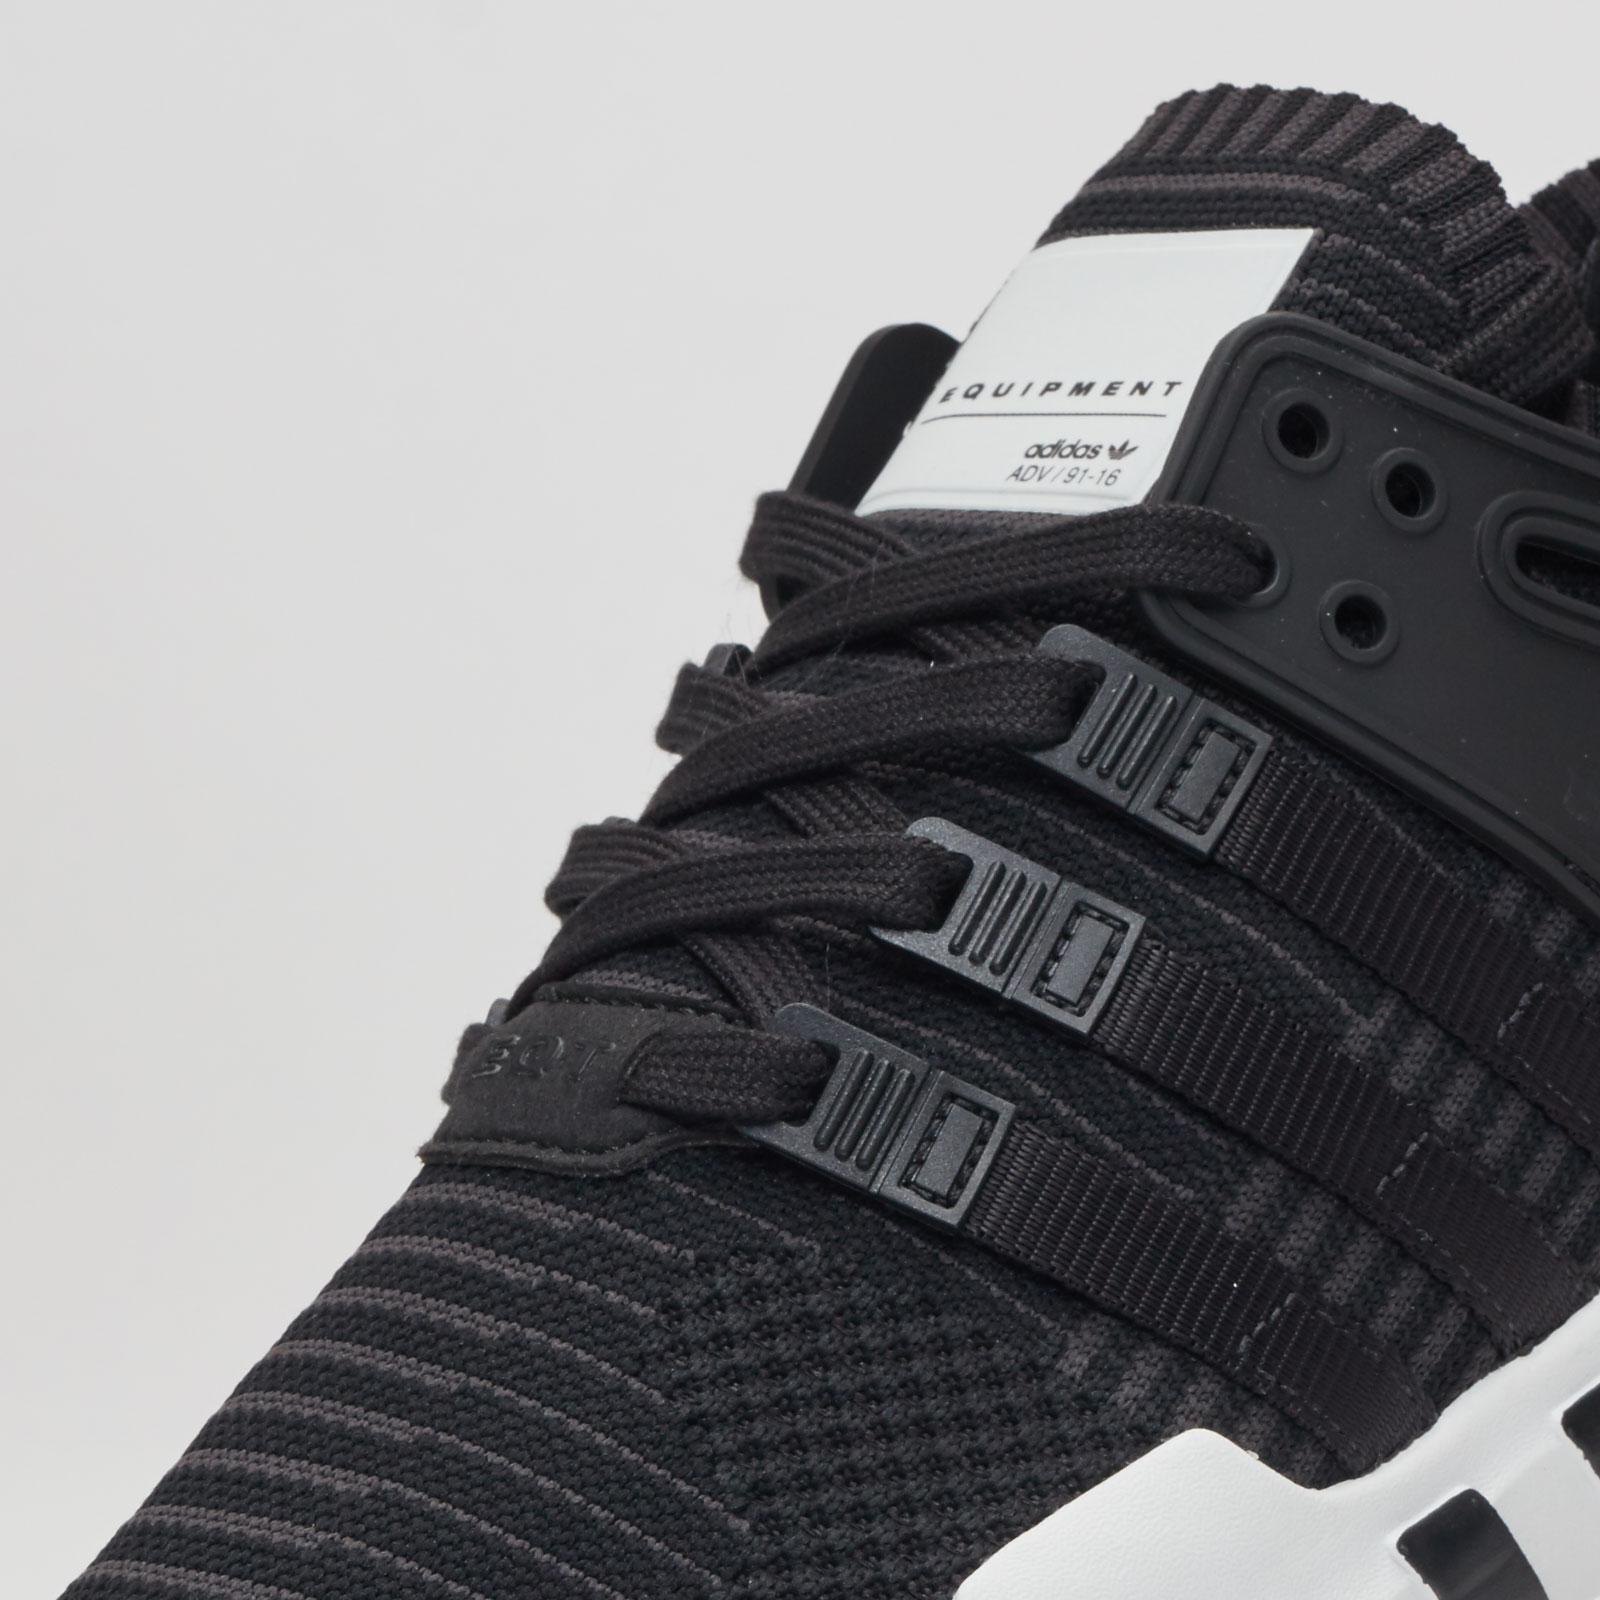 6e2788b282b7 adidas Eqt Support Adv Pk - Bb1260 - Sneakersnstuff